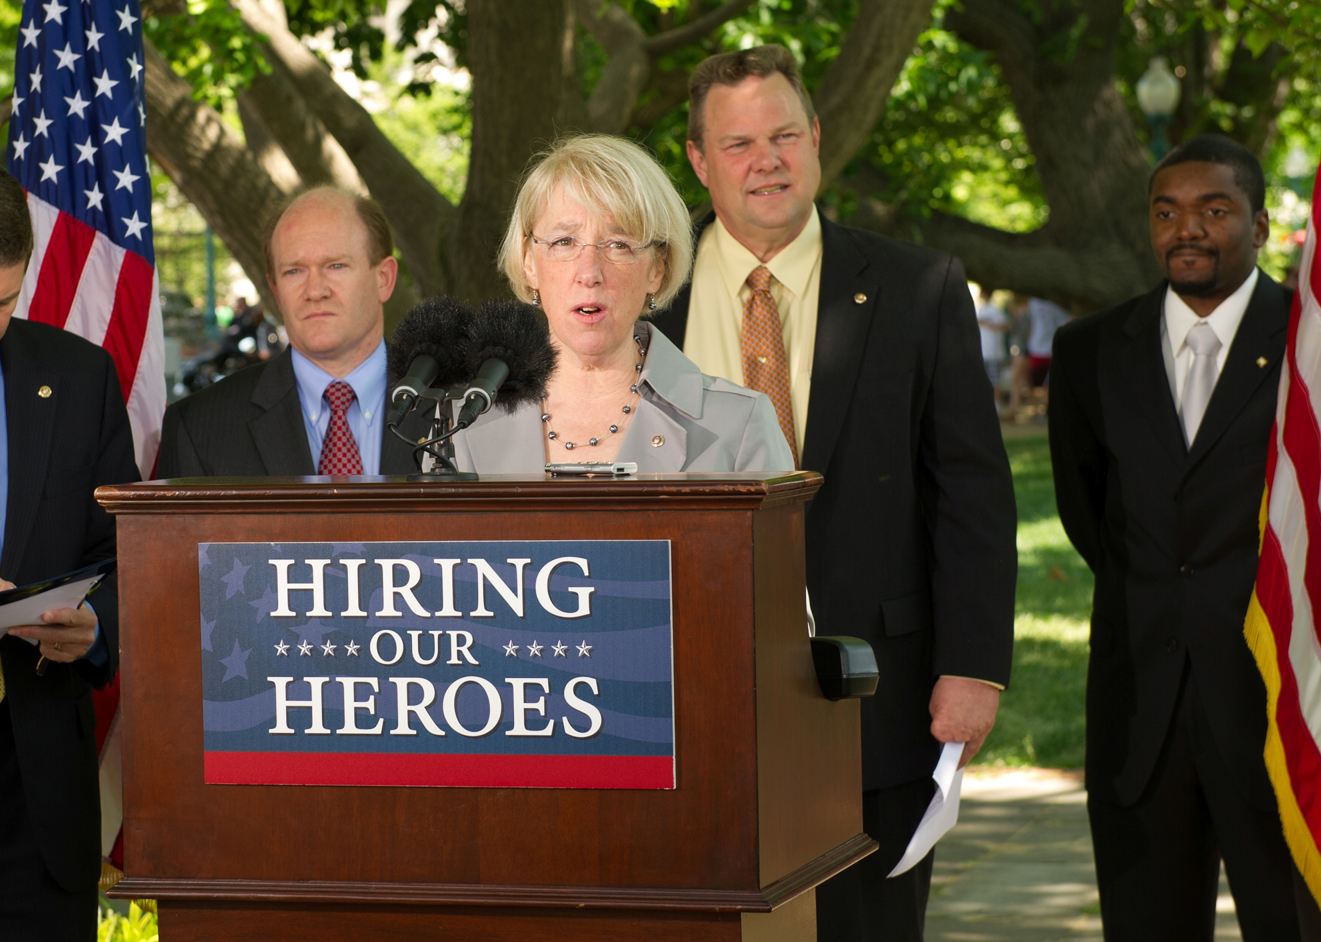 hiring_our_heroes_Murray